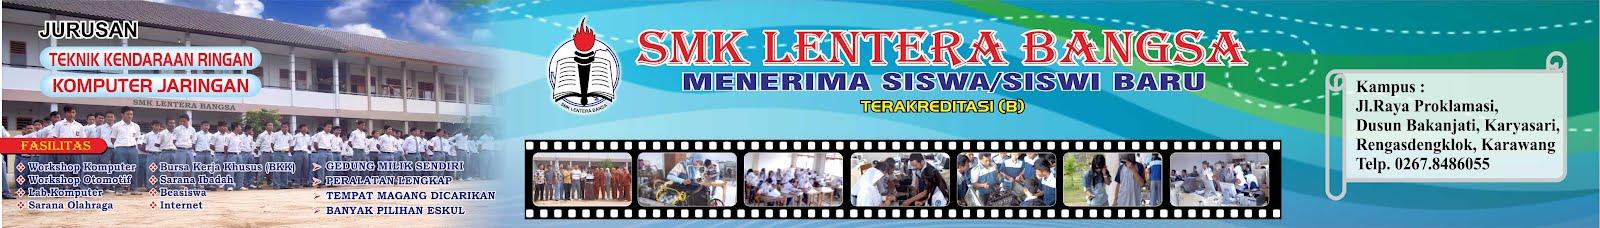 SMK LENTERA BANGSA KARAWANG